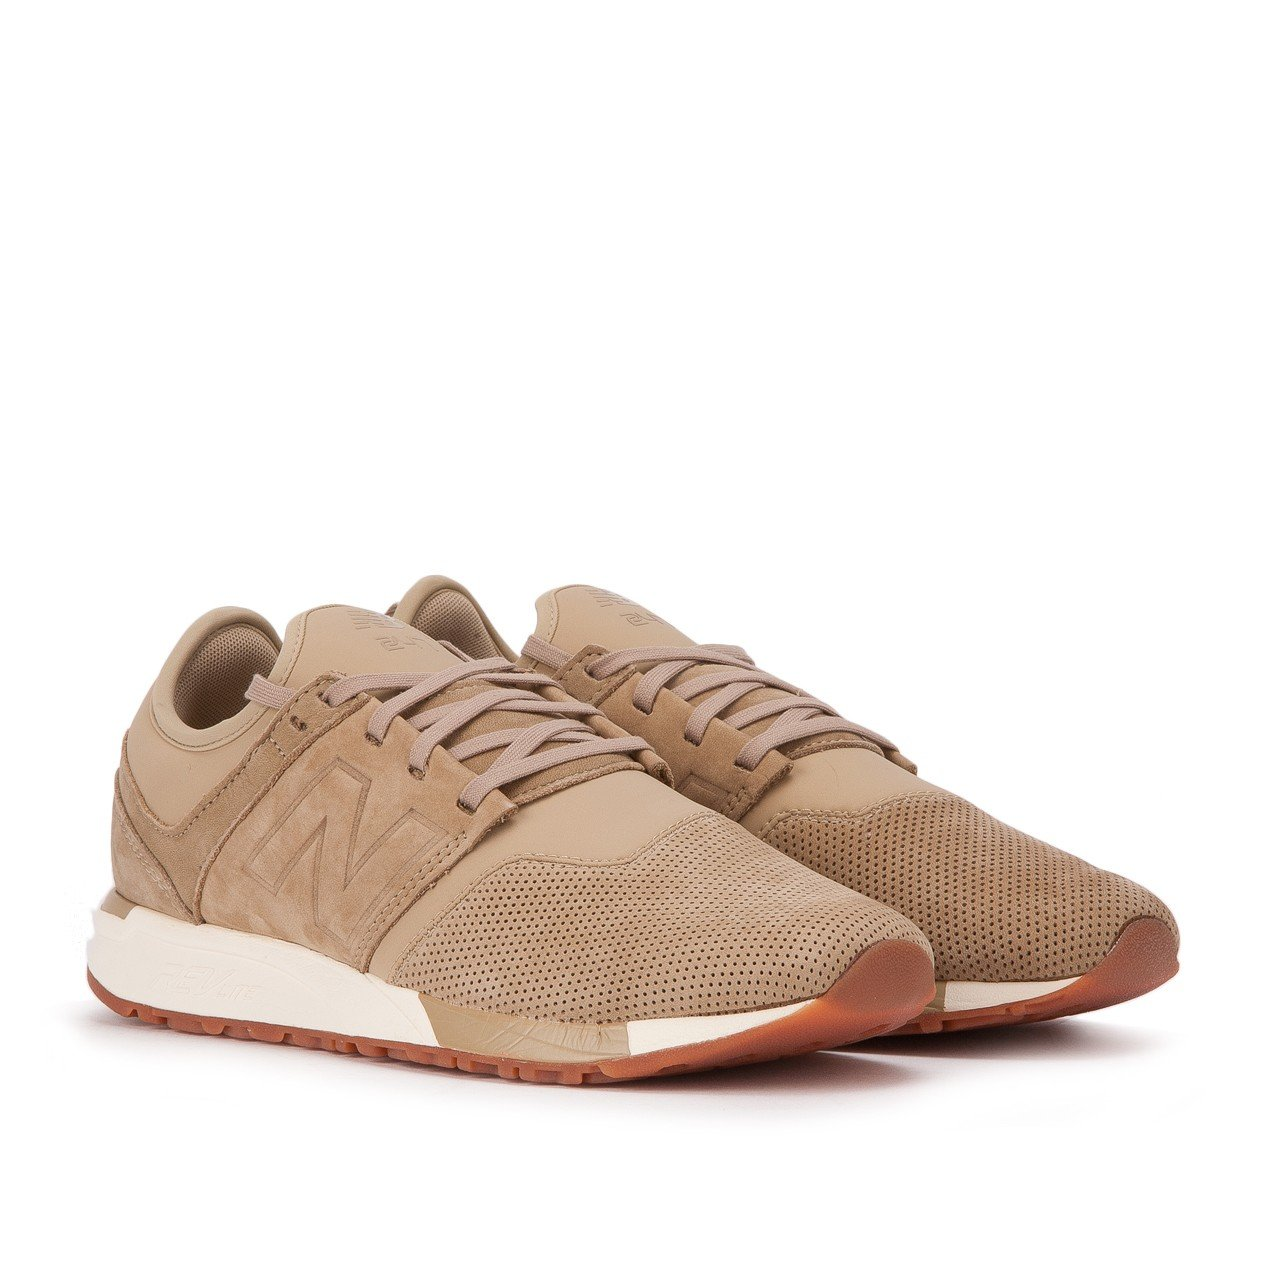 New Balance Herren 247 Classic Mesh Sneaker hemp/vert